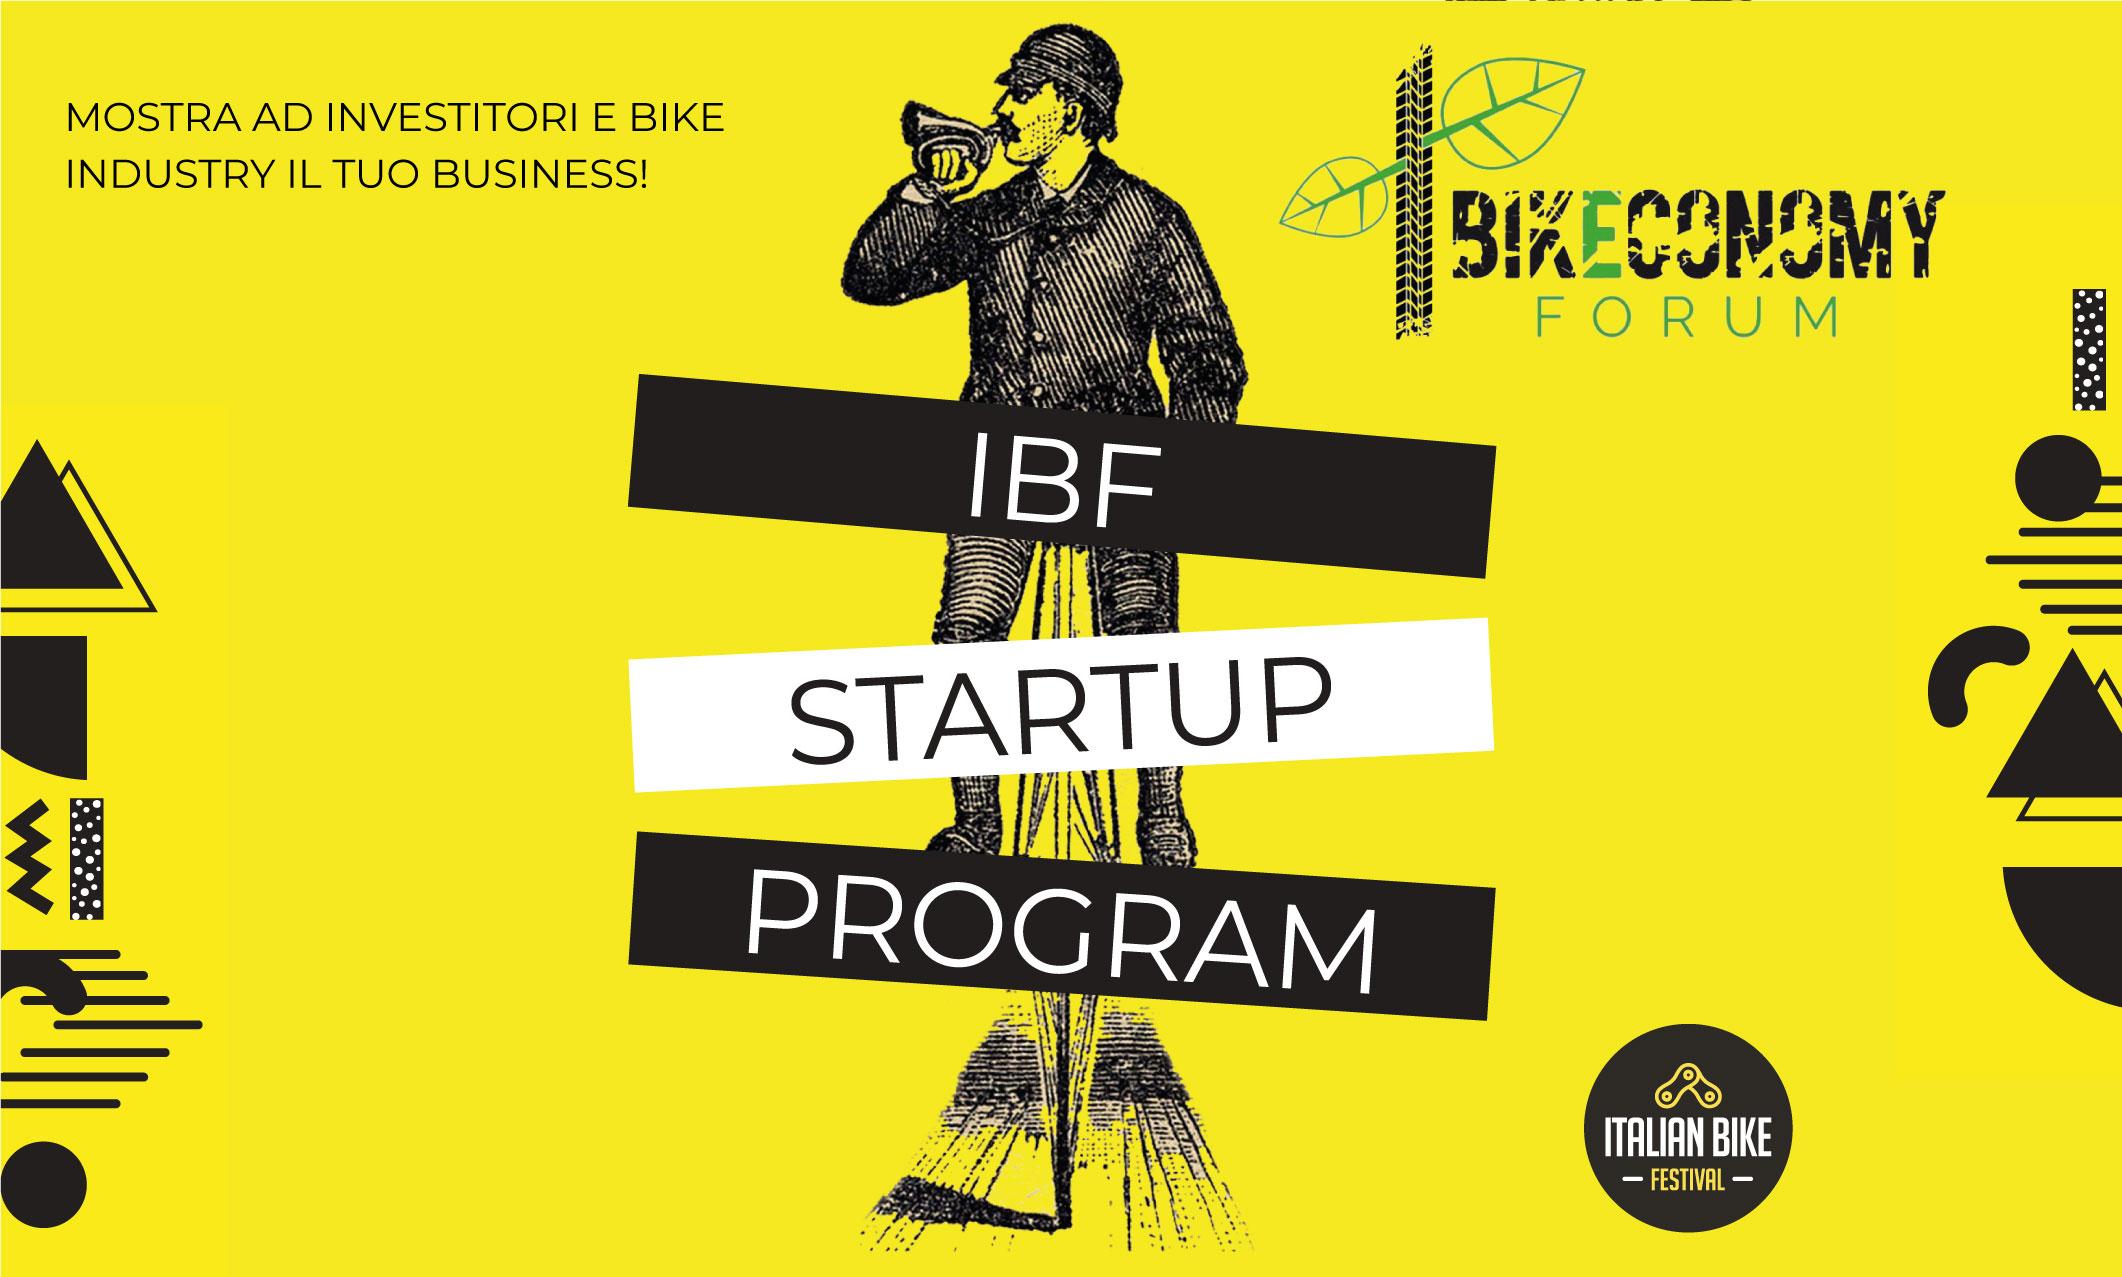 IBF STARTUP PROGRAM